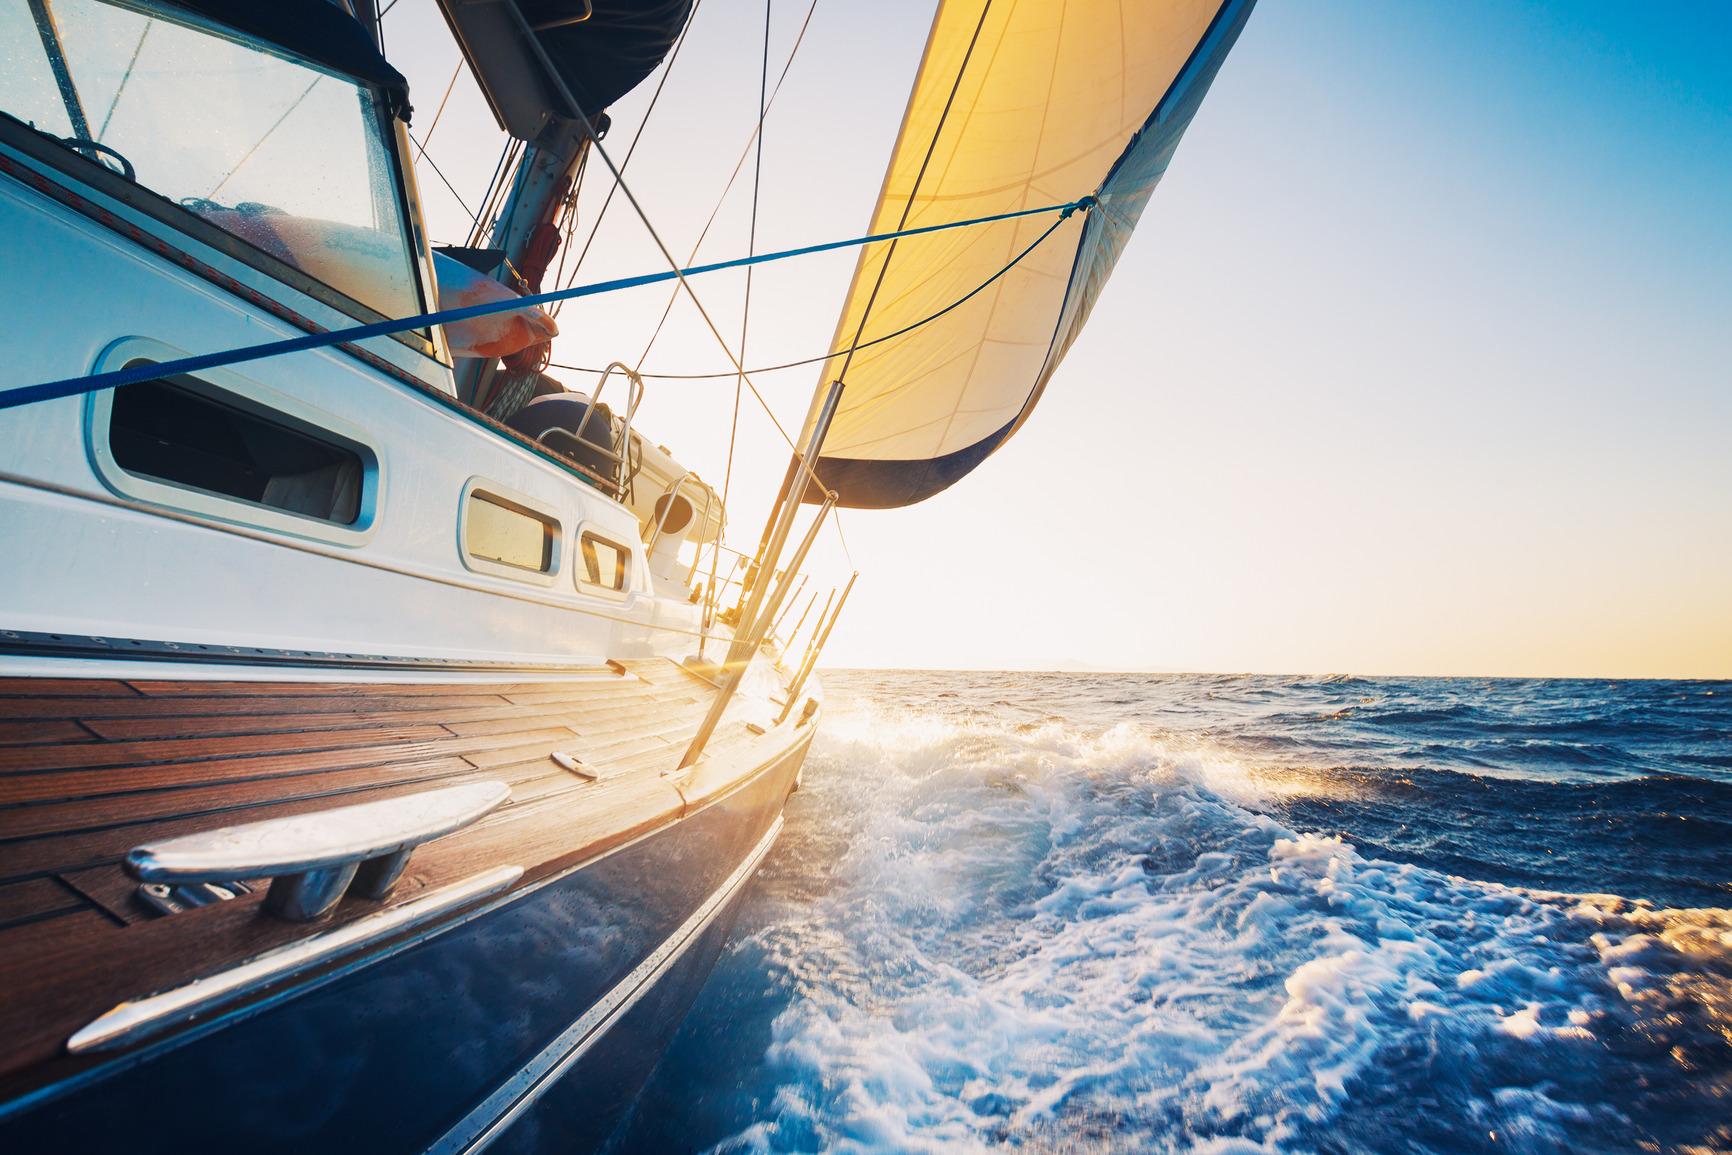 photodune-2650397-sailing-m